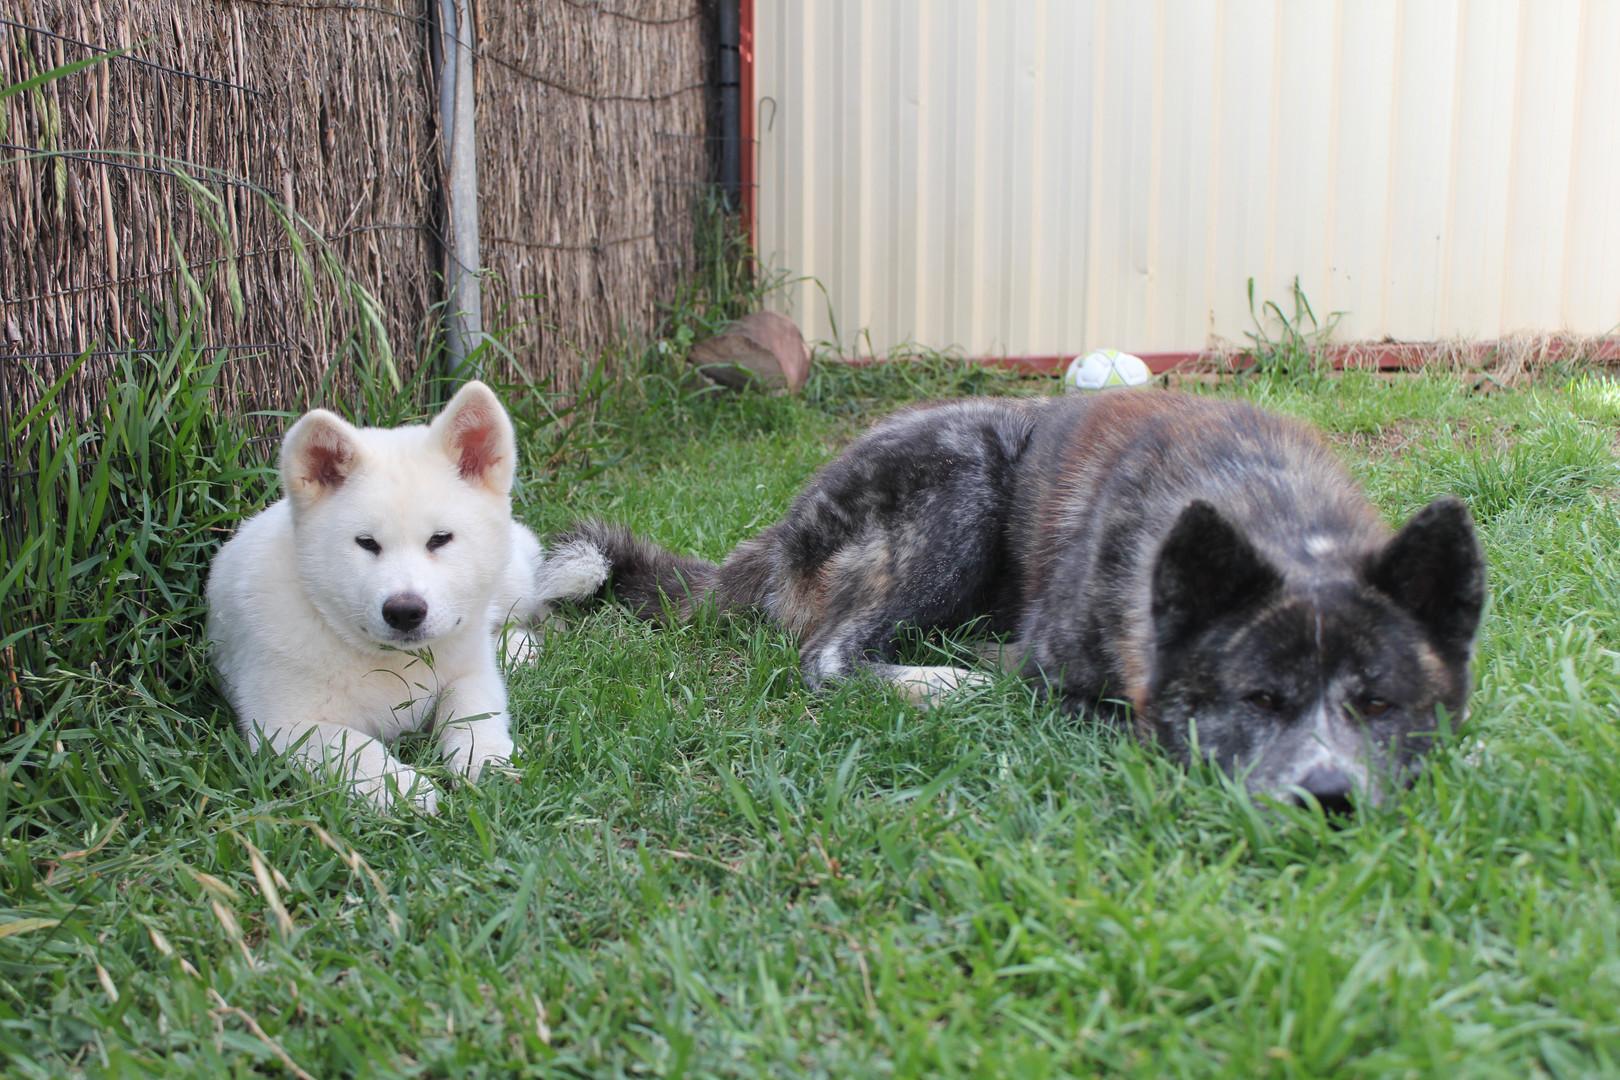 Saki and Momo the Akitas relaxing in the